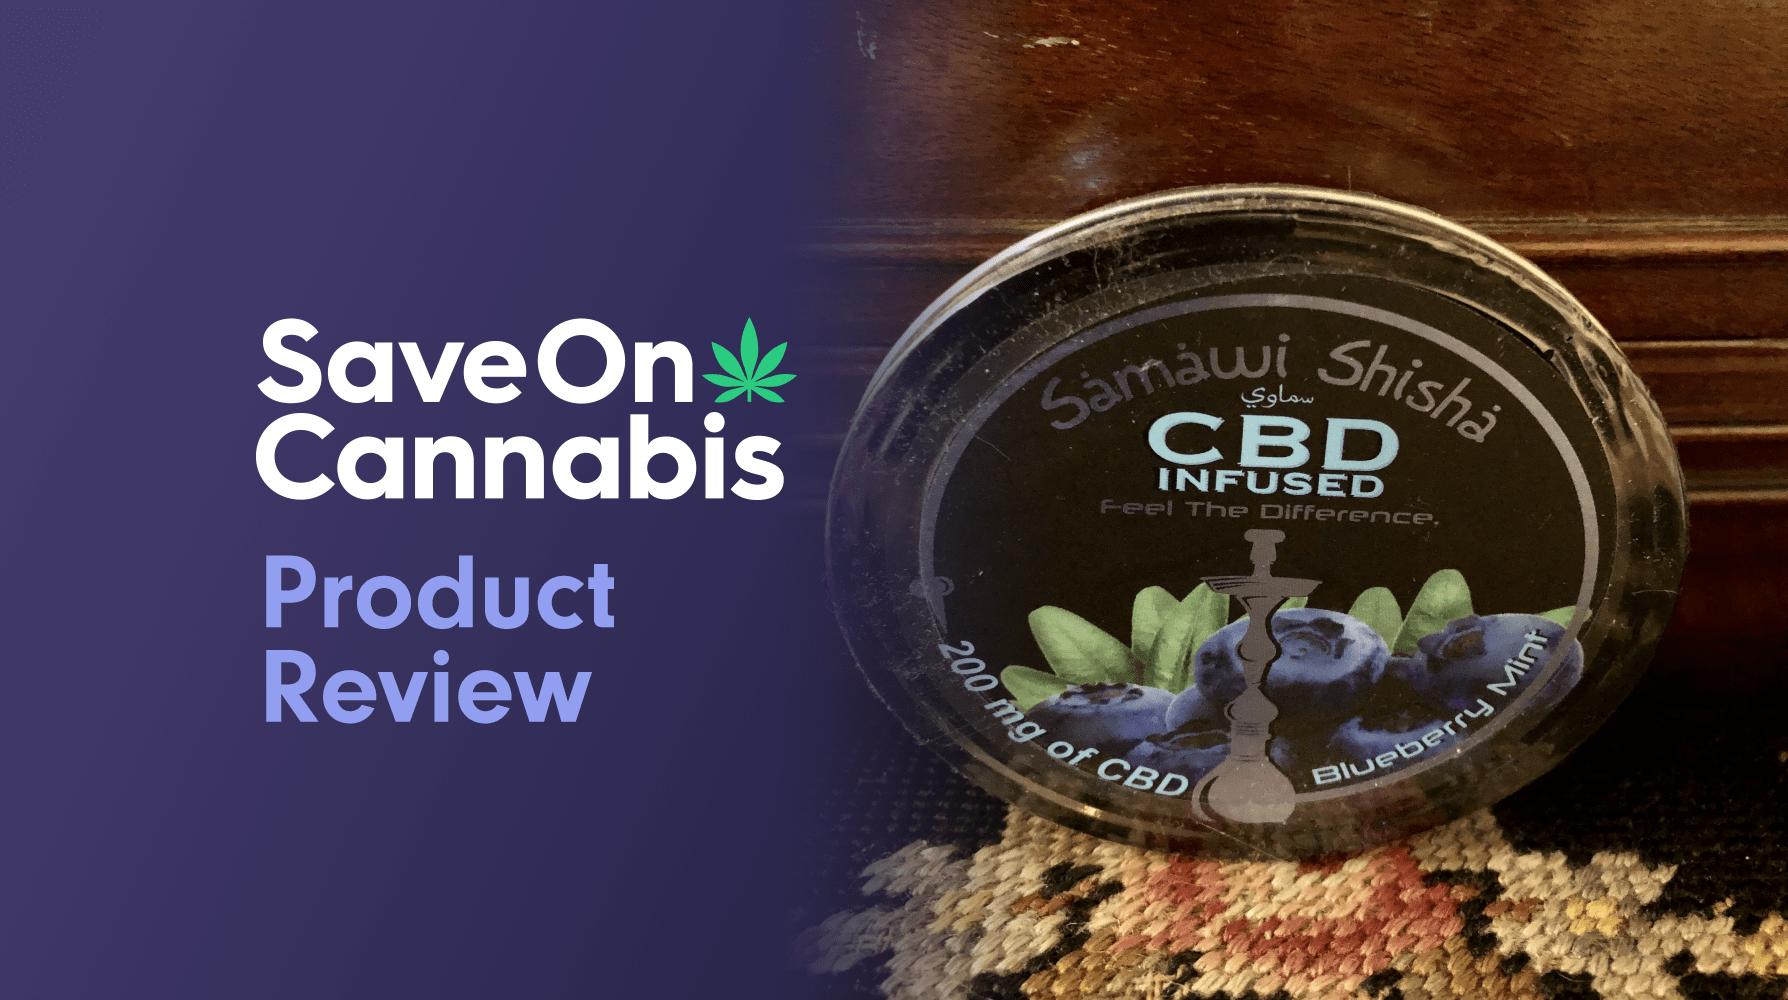 Flora CBD Blueberry Mint Shisha 200 mg Save On cannabis Review Website